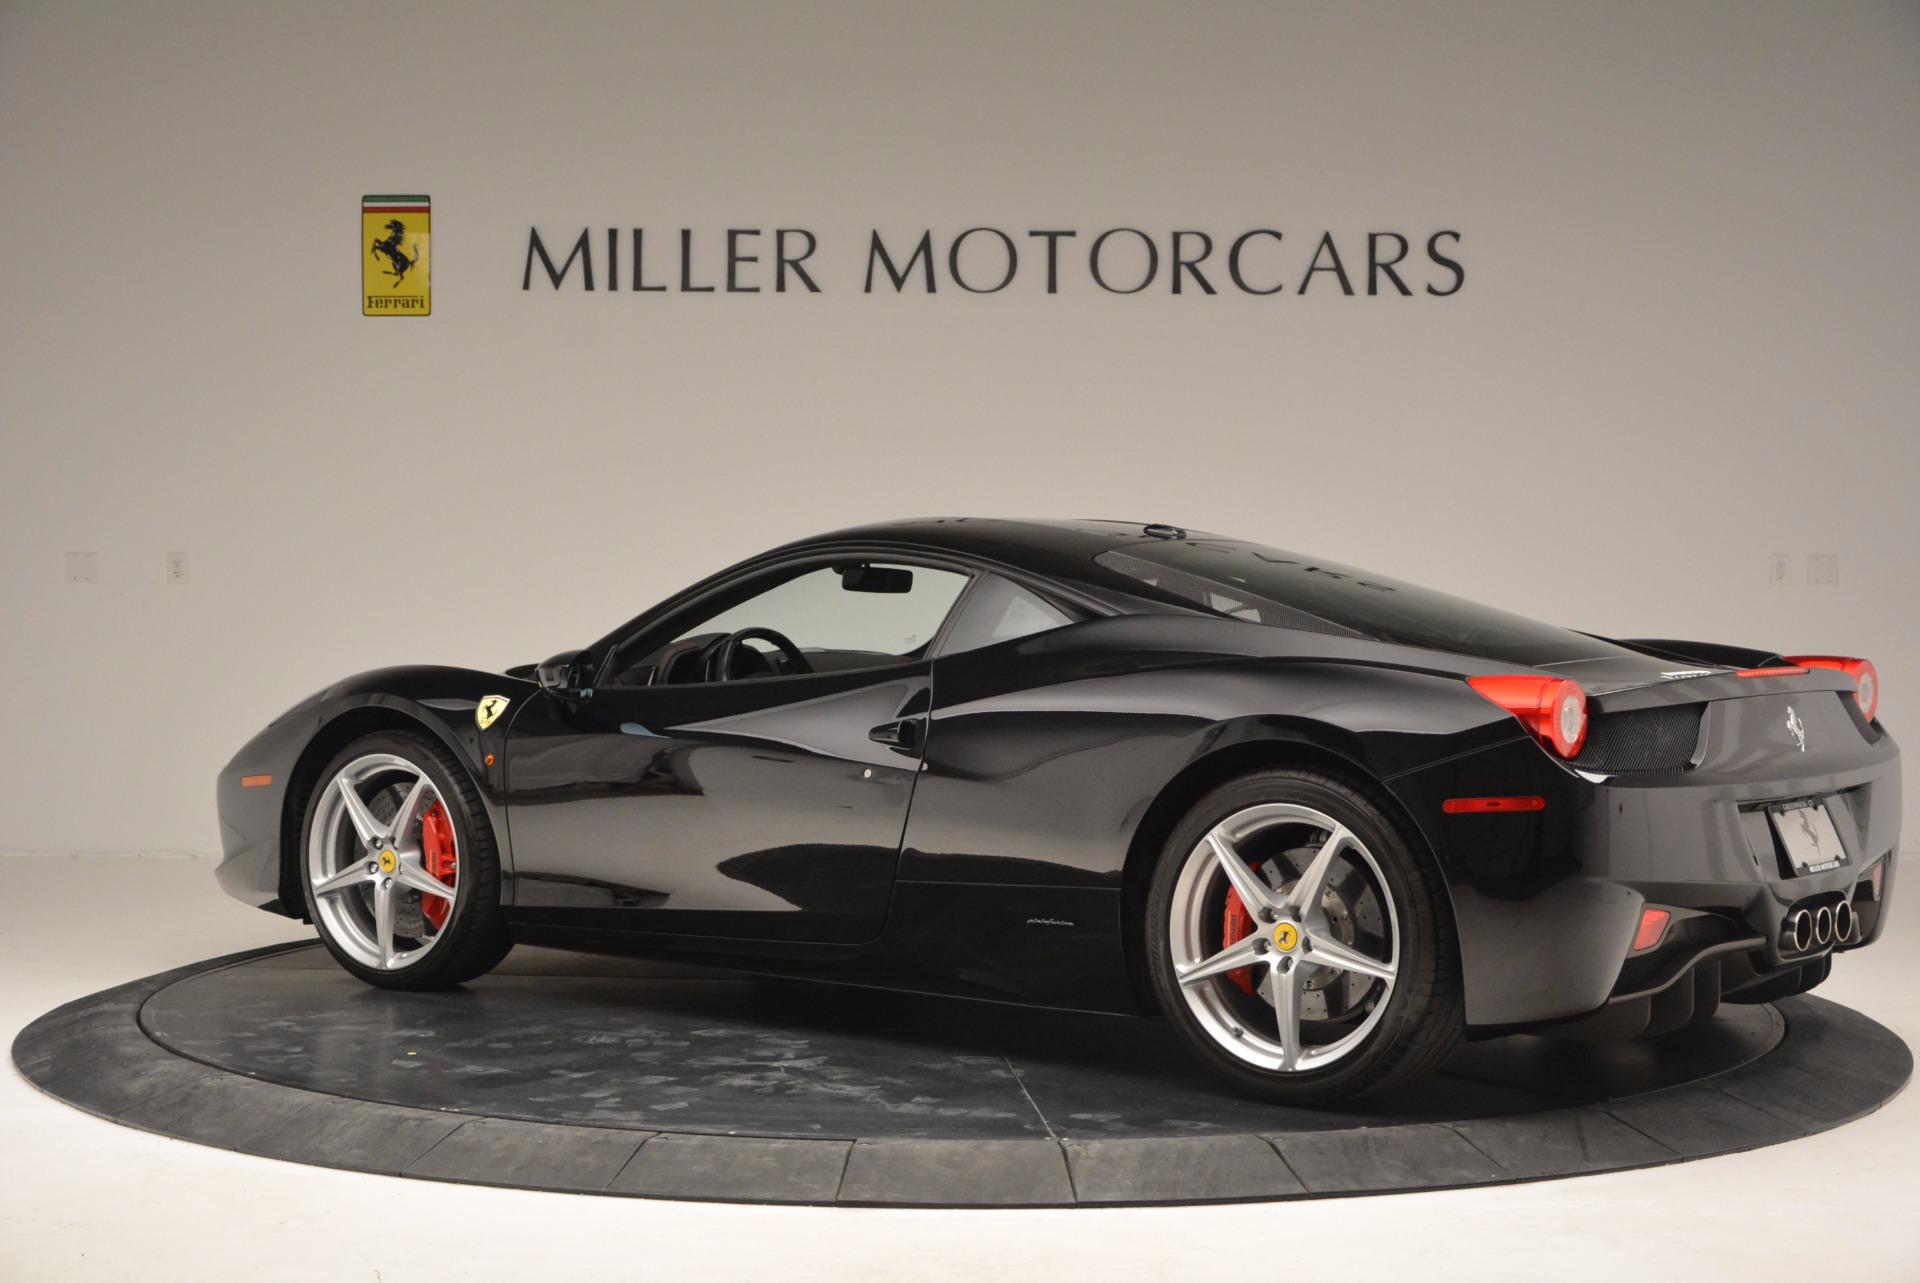 contract italia lease business deals car new hire spider leasing ferrari auto